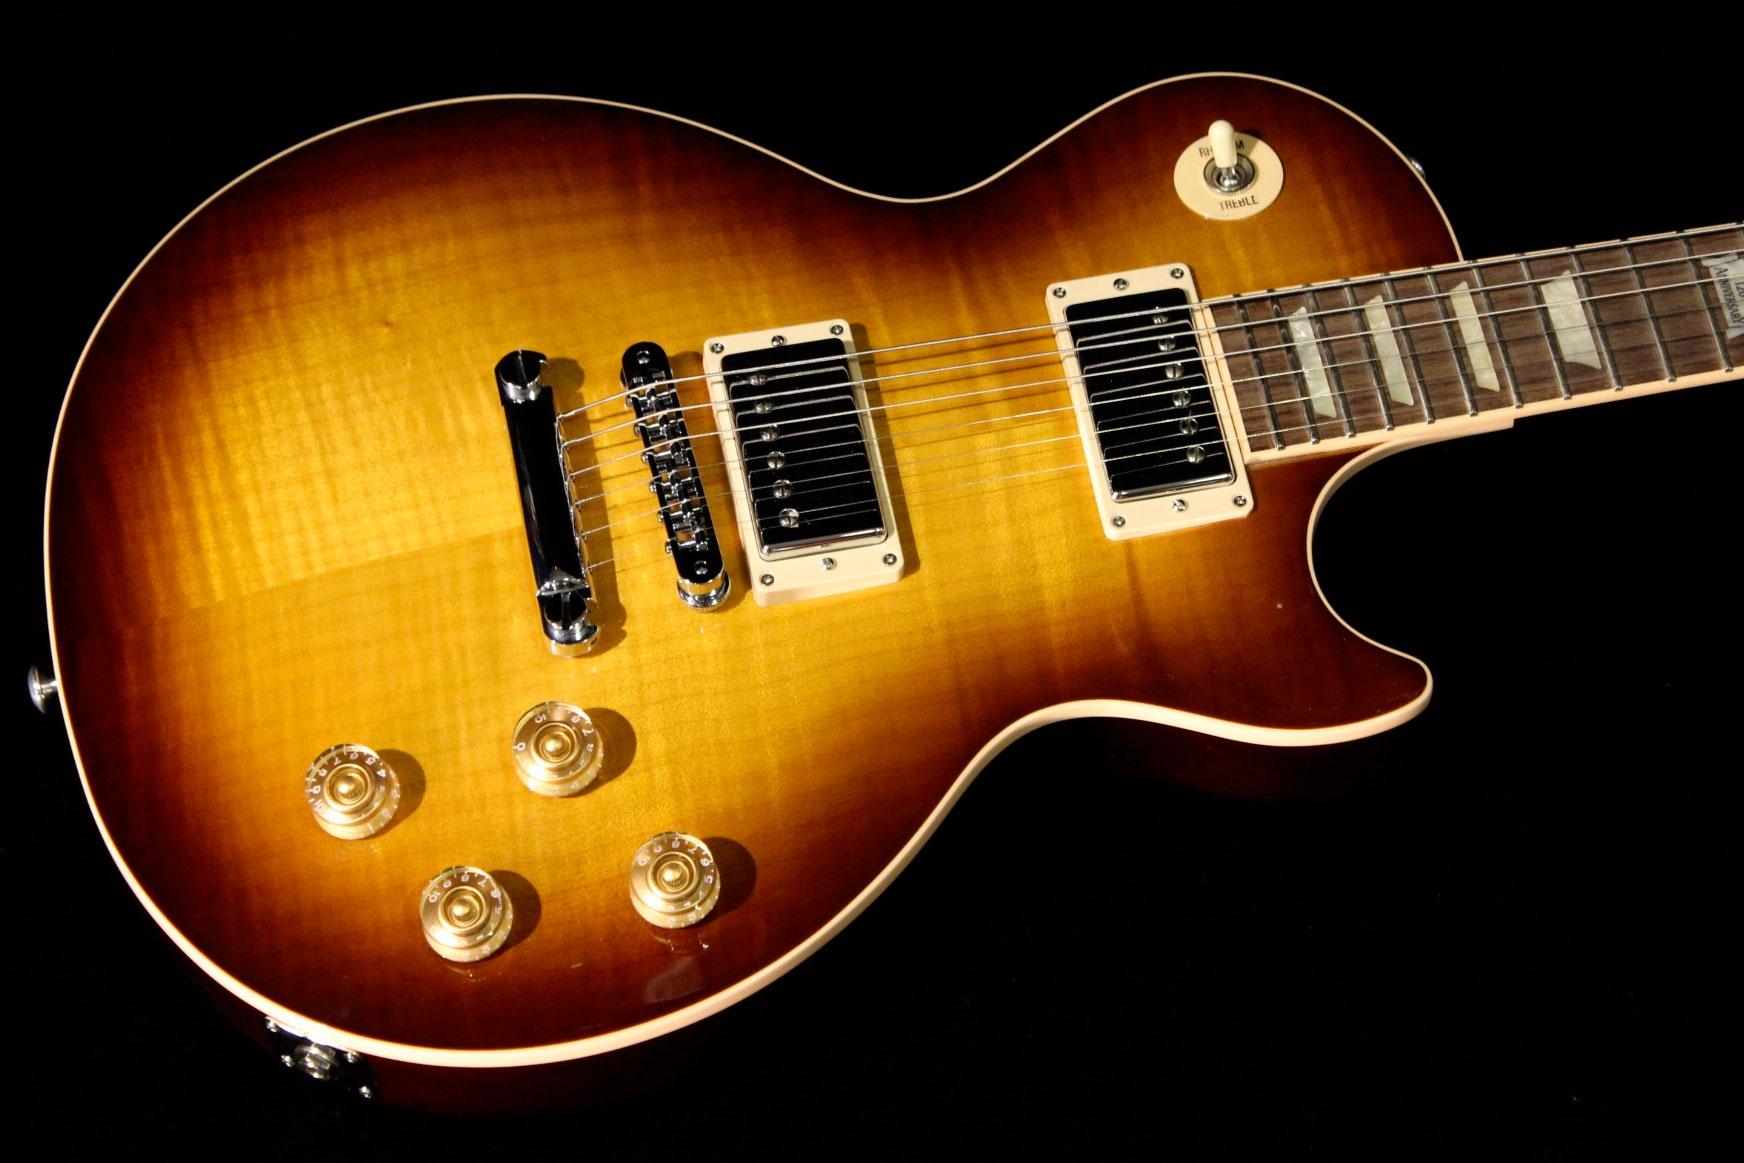 Gibson Les Paul Standard 2014 Tobacco Sunburst  Sn